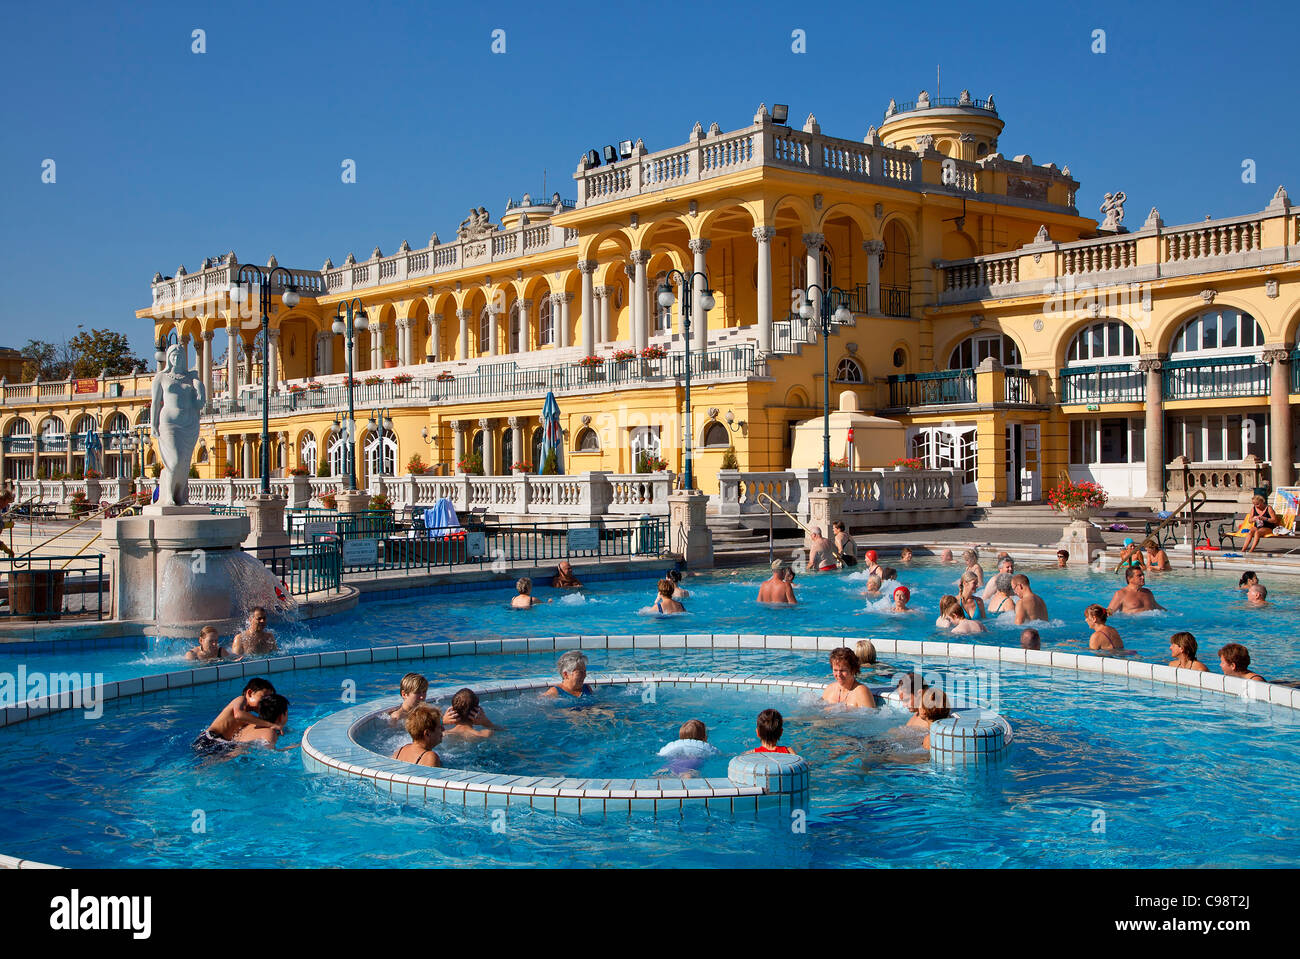 Budapest Szechenyi Baths Stock Photos & Budapest Szechenyi Baths ...